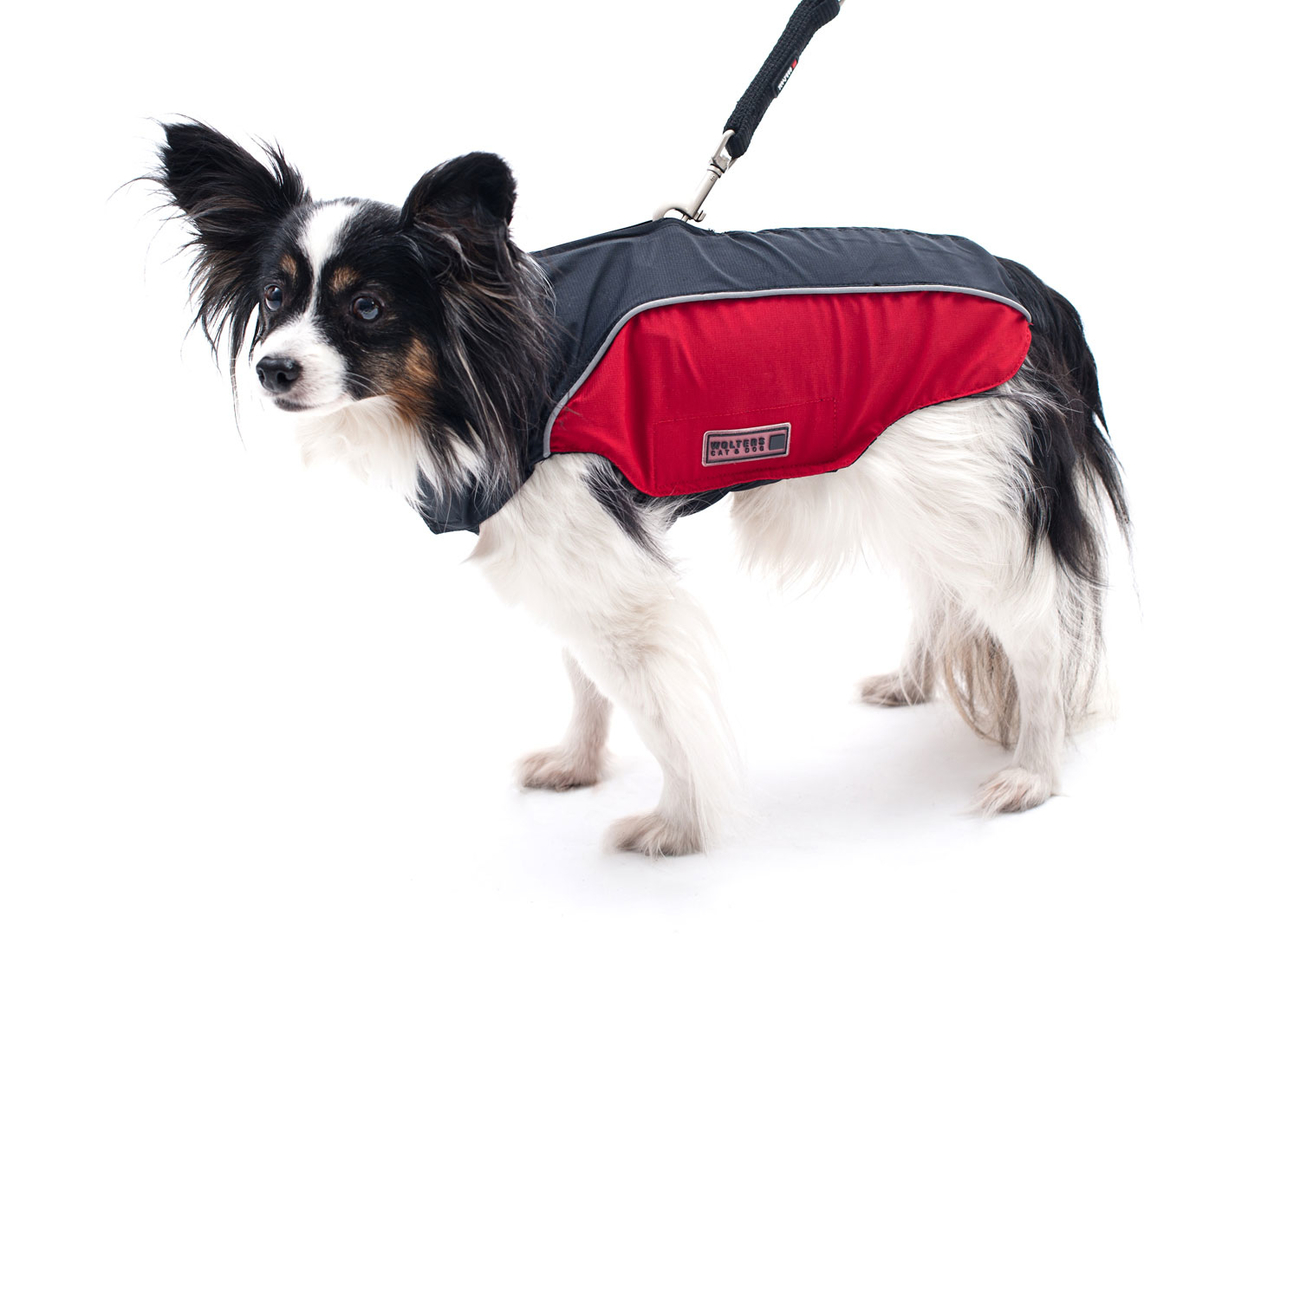 Wolters Regenjacke für Hunde Easy Rain, Bild 9